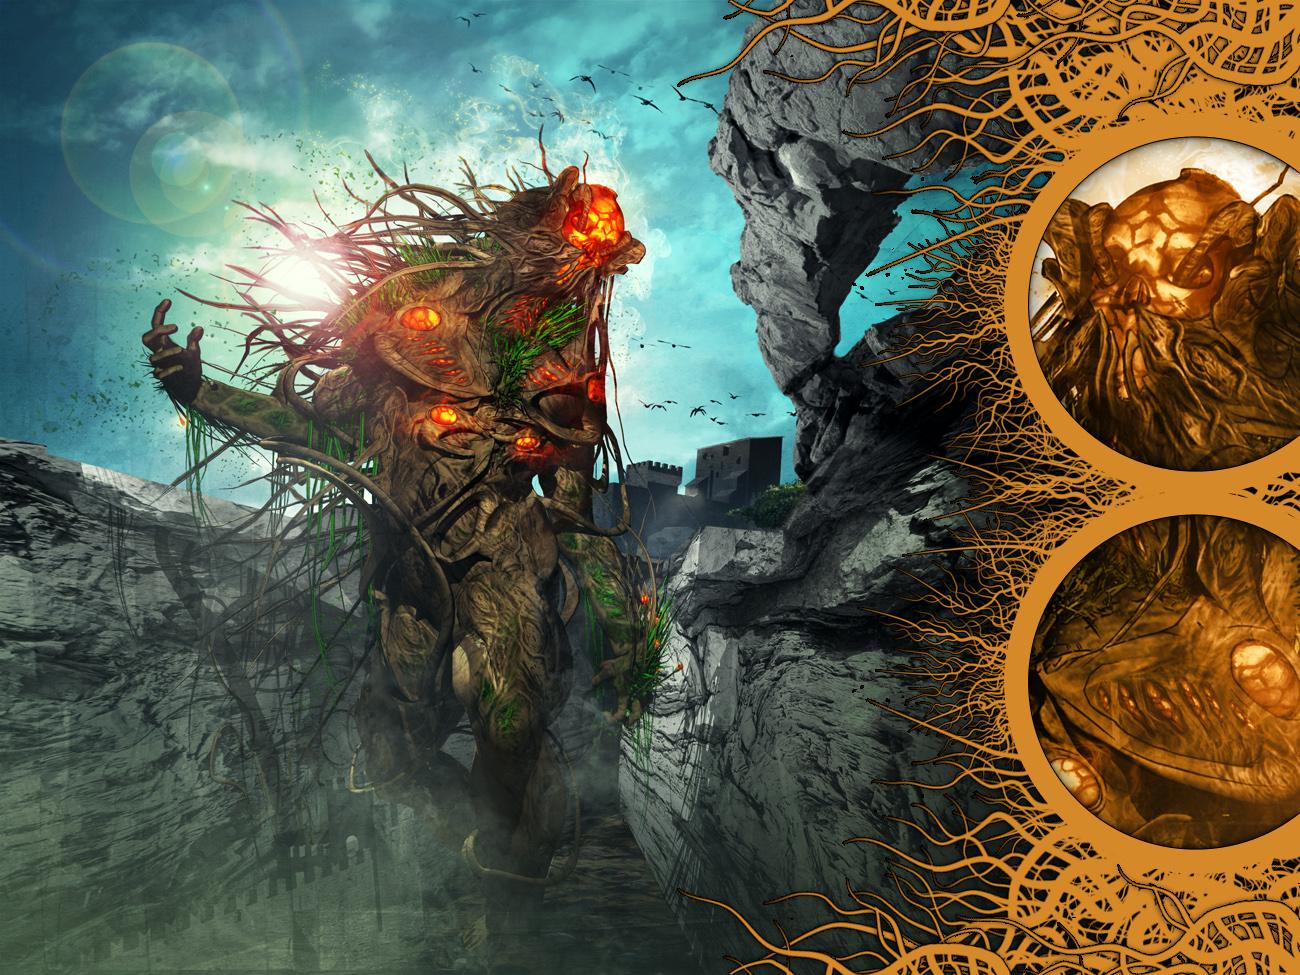 Deadhead Paein - Life Colossus by STB01